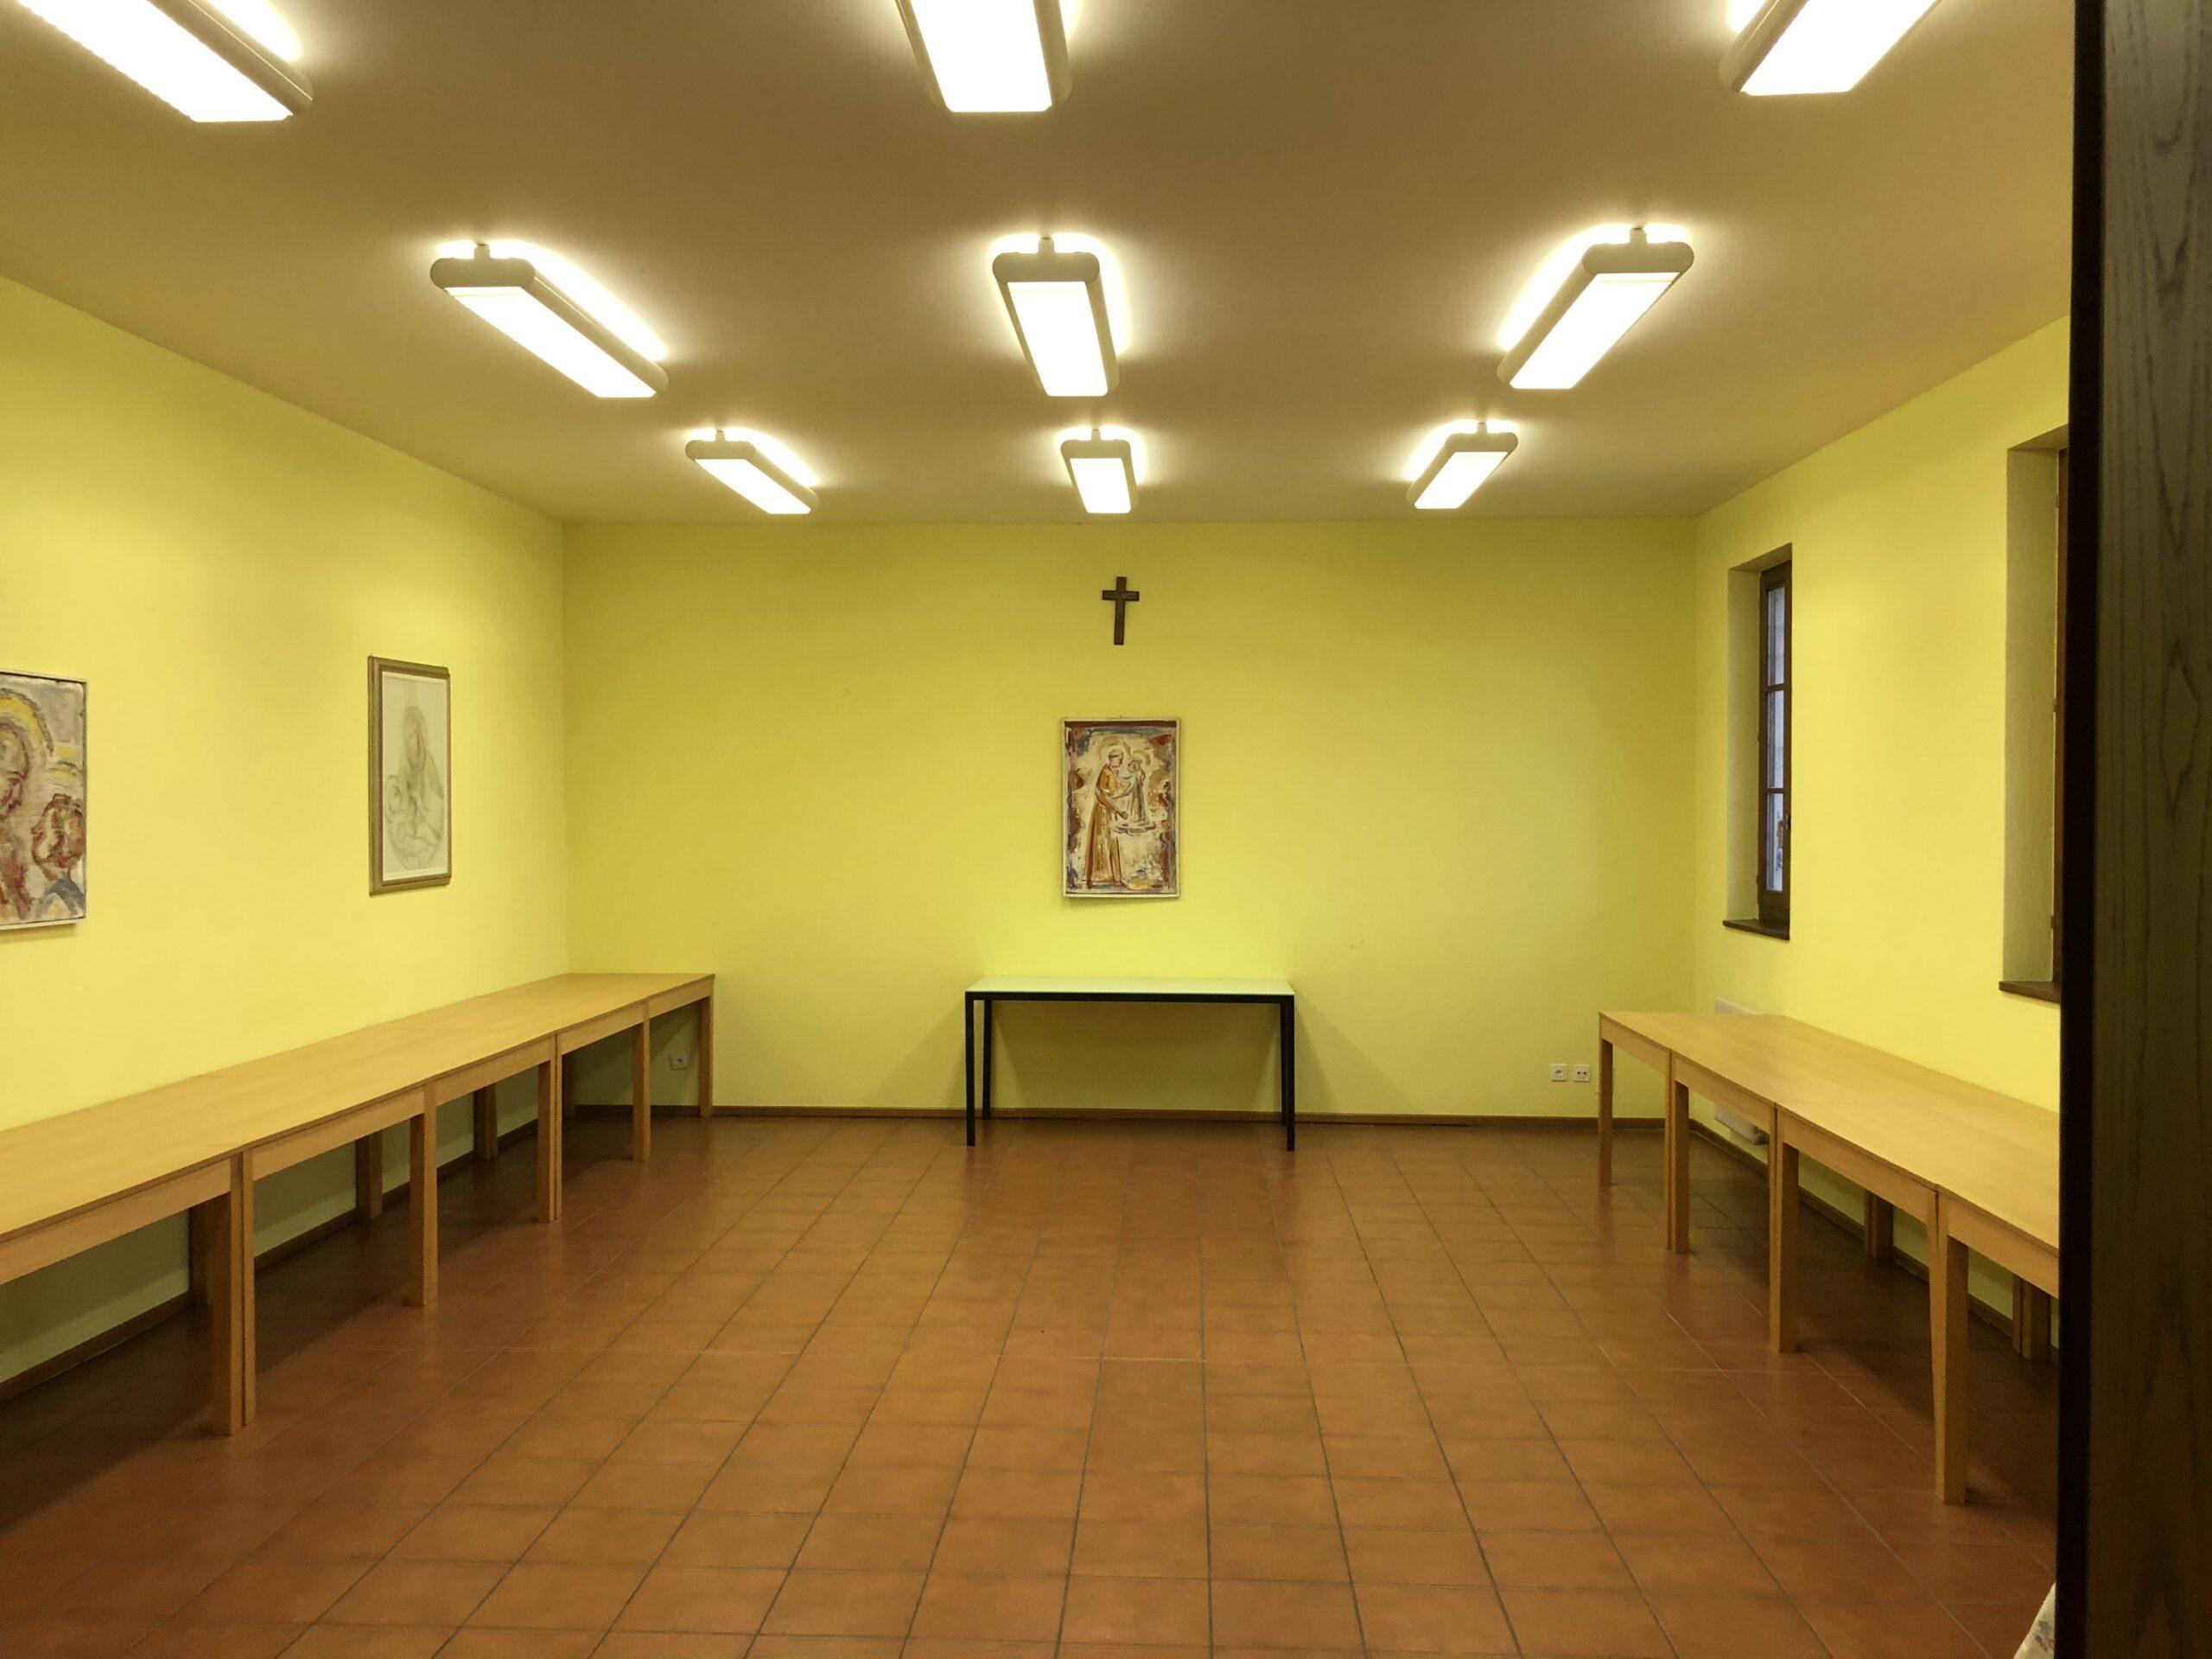 sala parrocchiale barbengo grancia